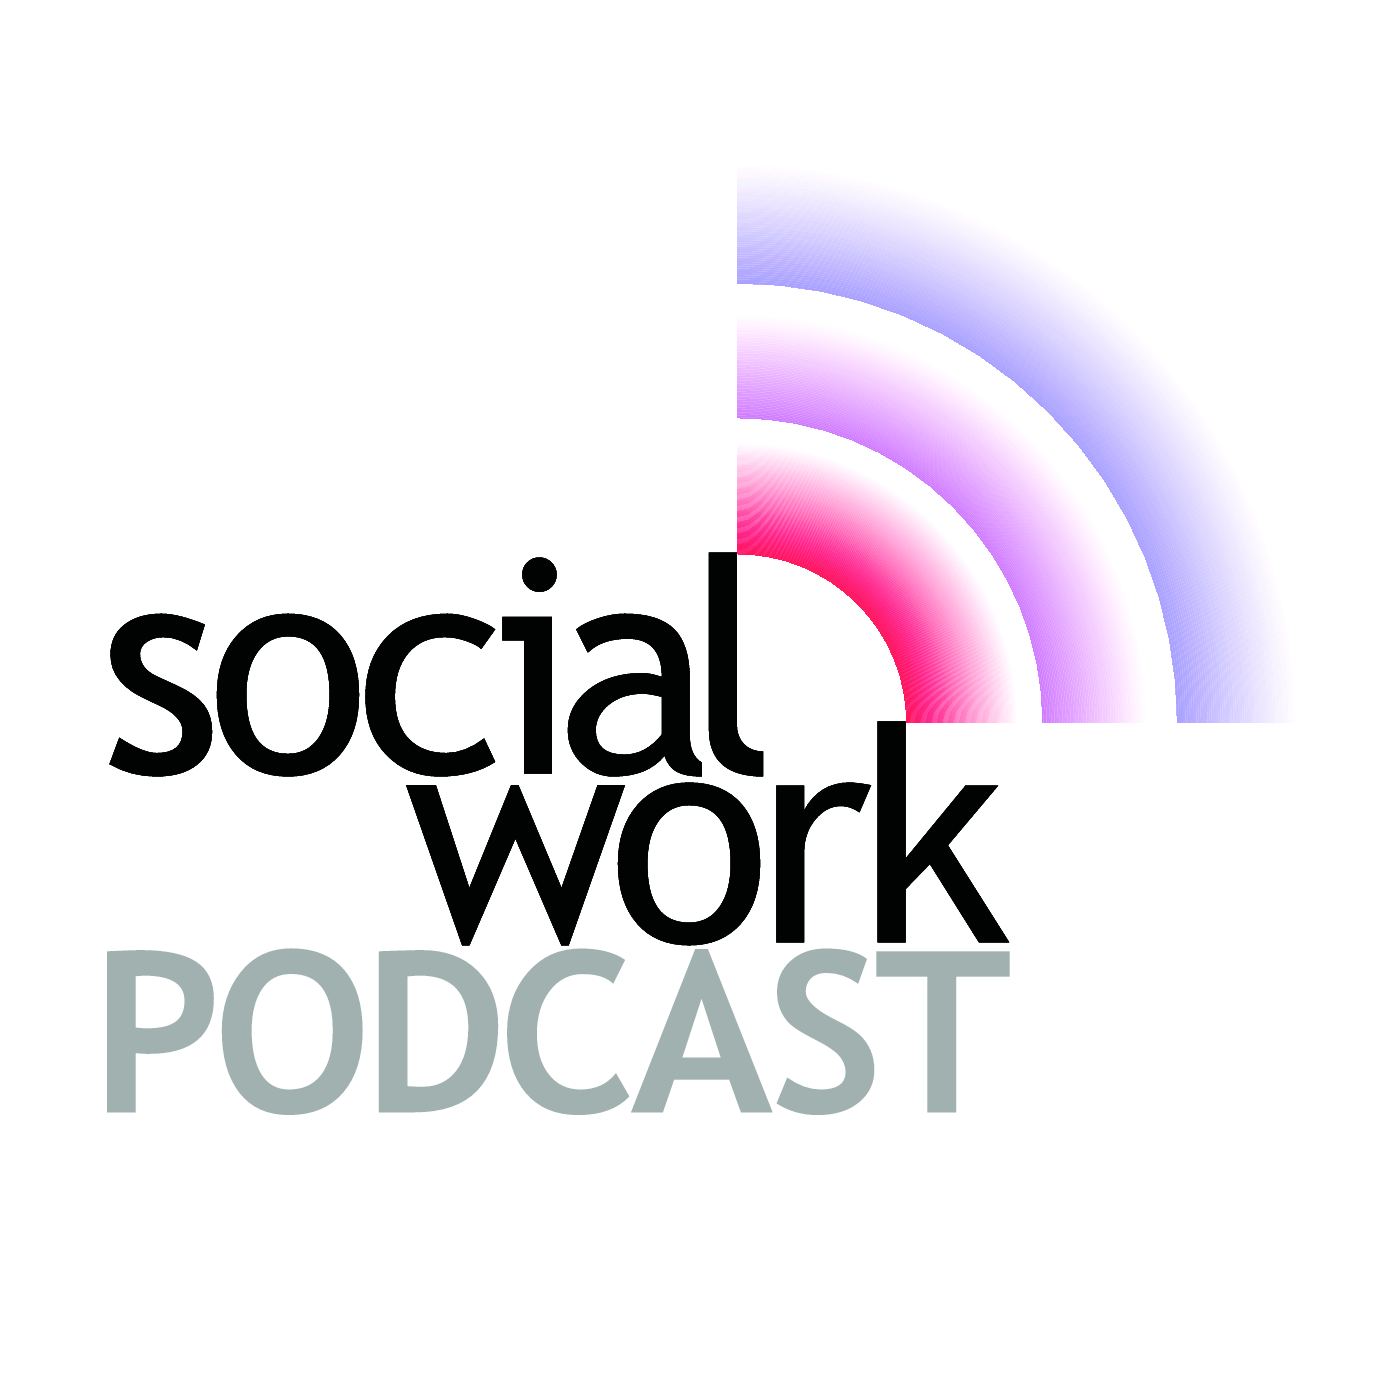 psychodynamic theory in social work practice